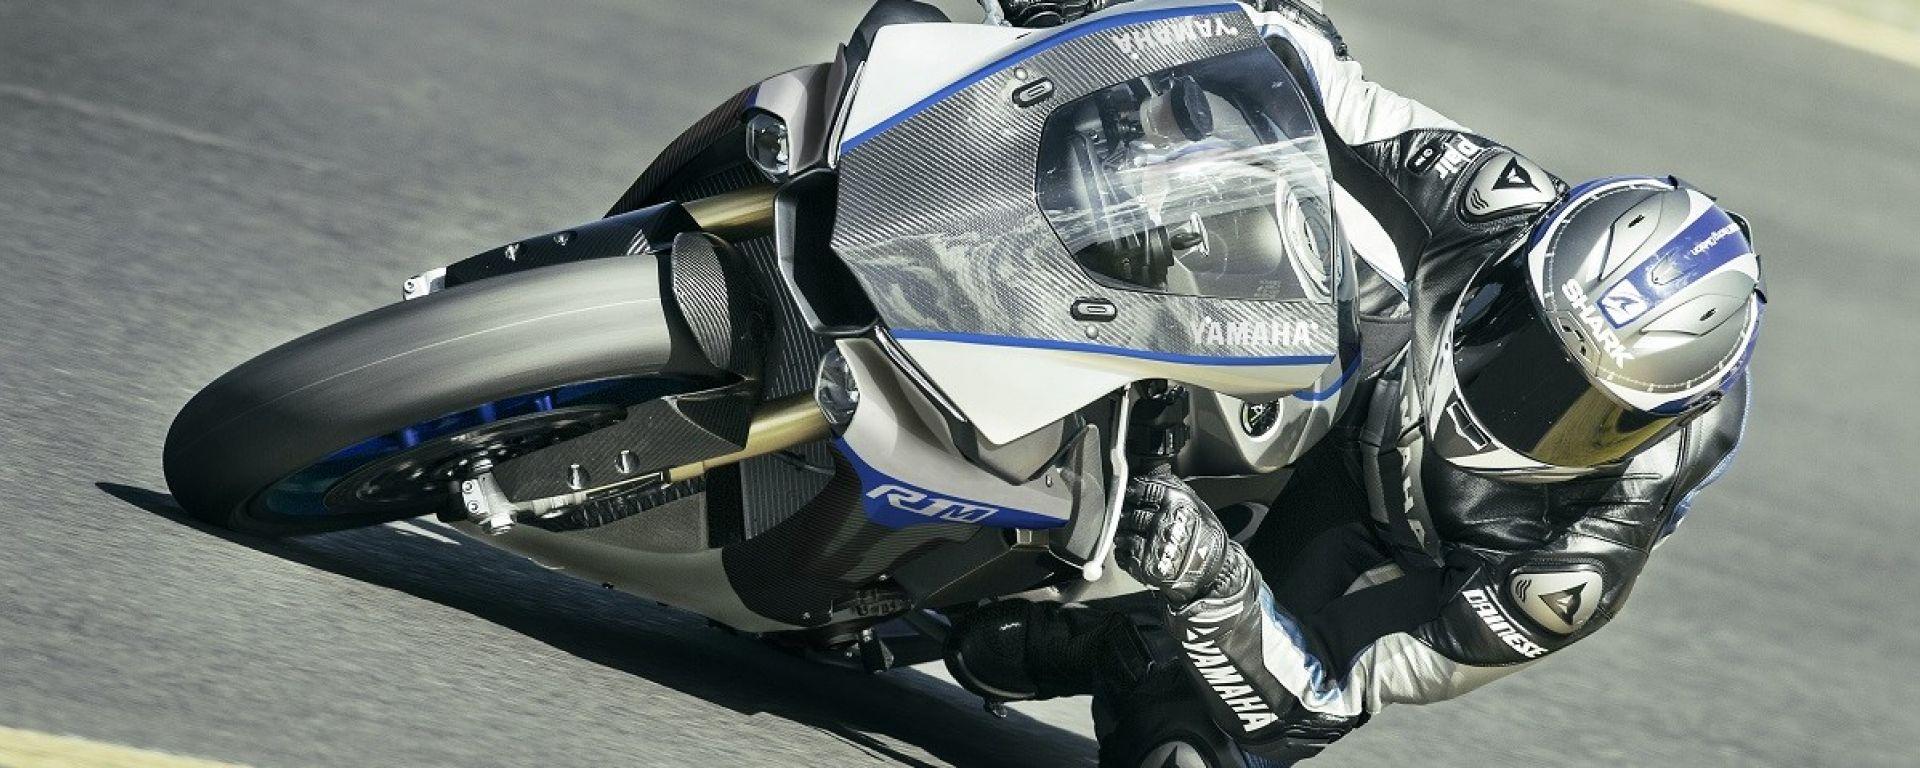 Shark Helmets Race-R Pro R1 Cup